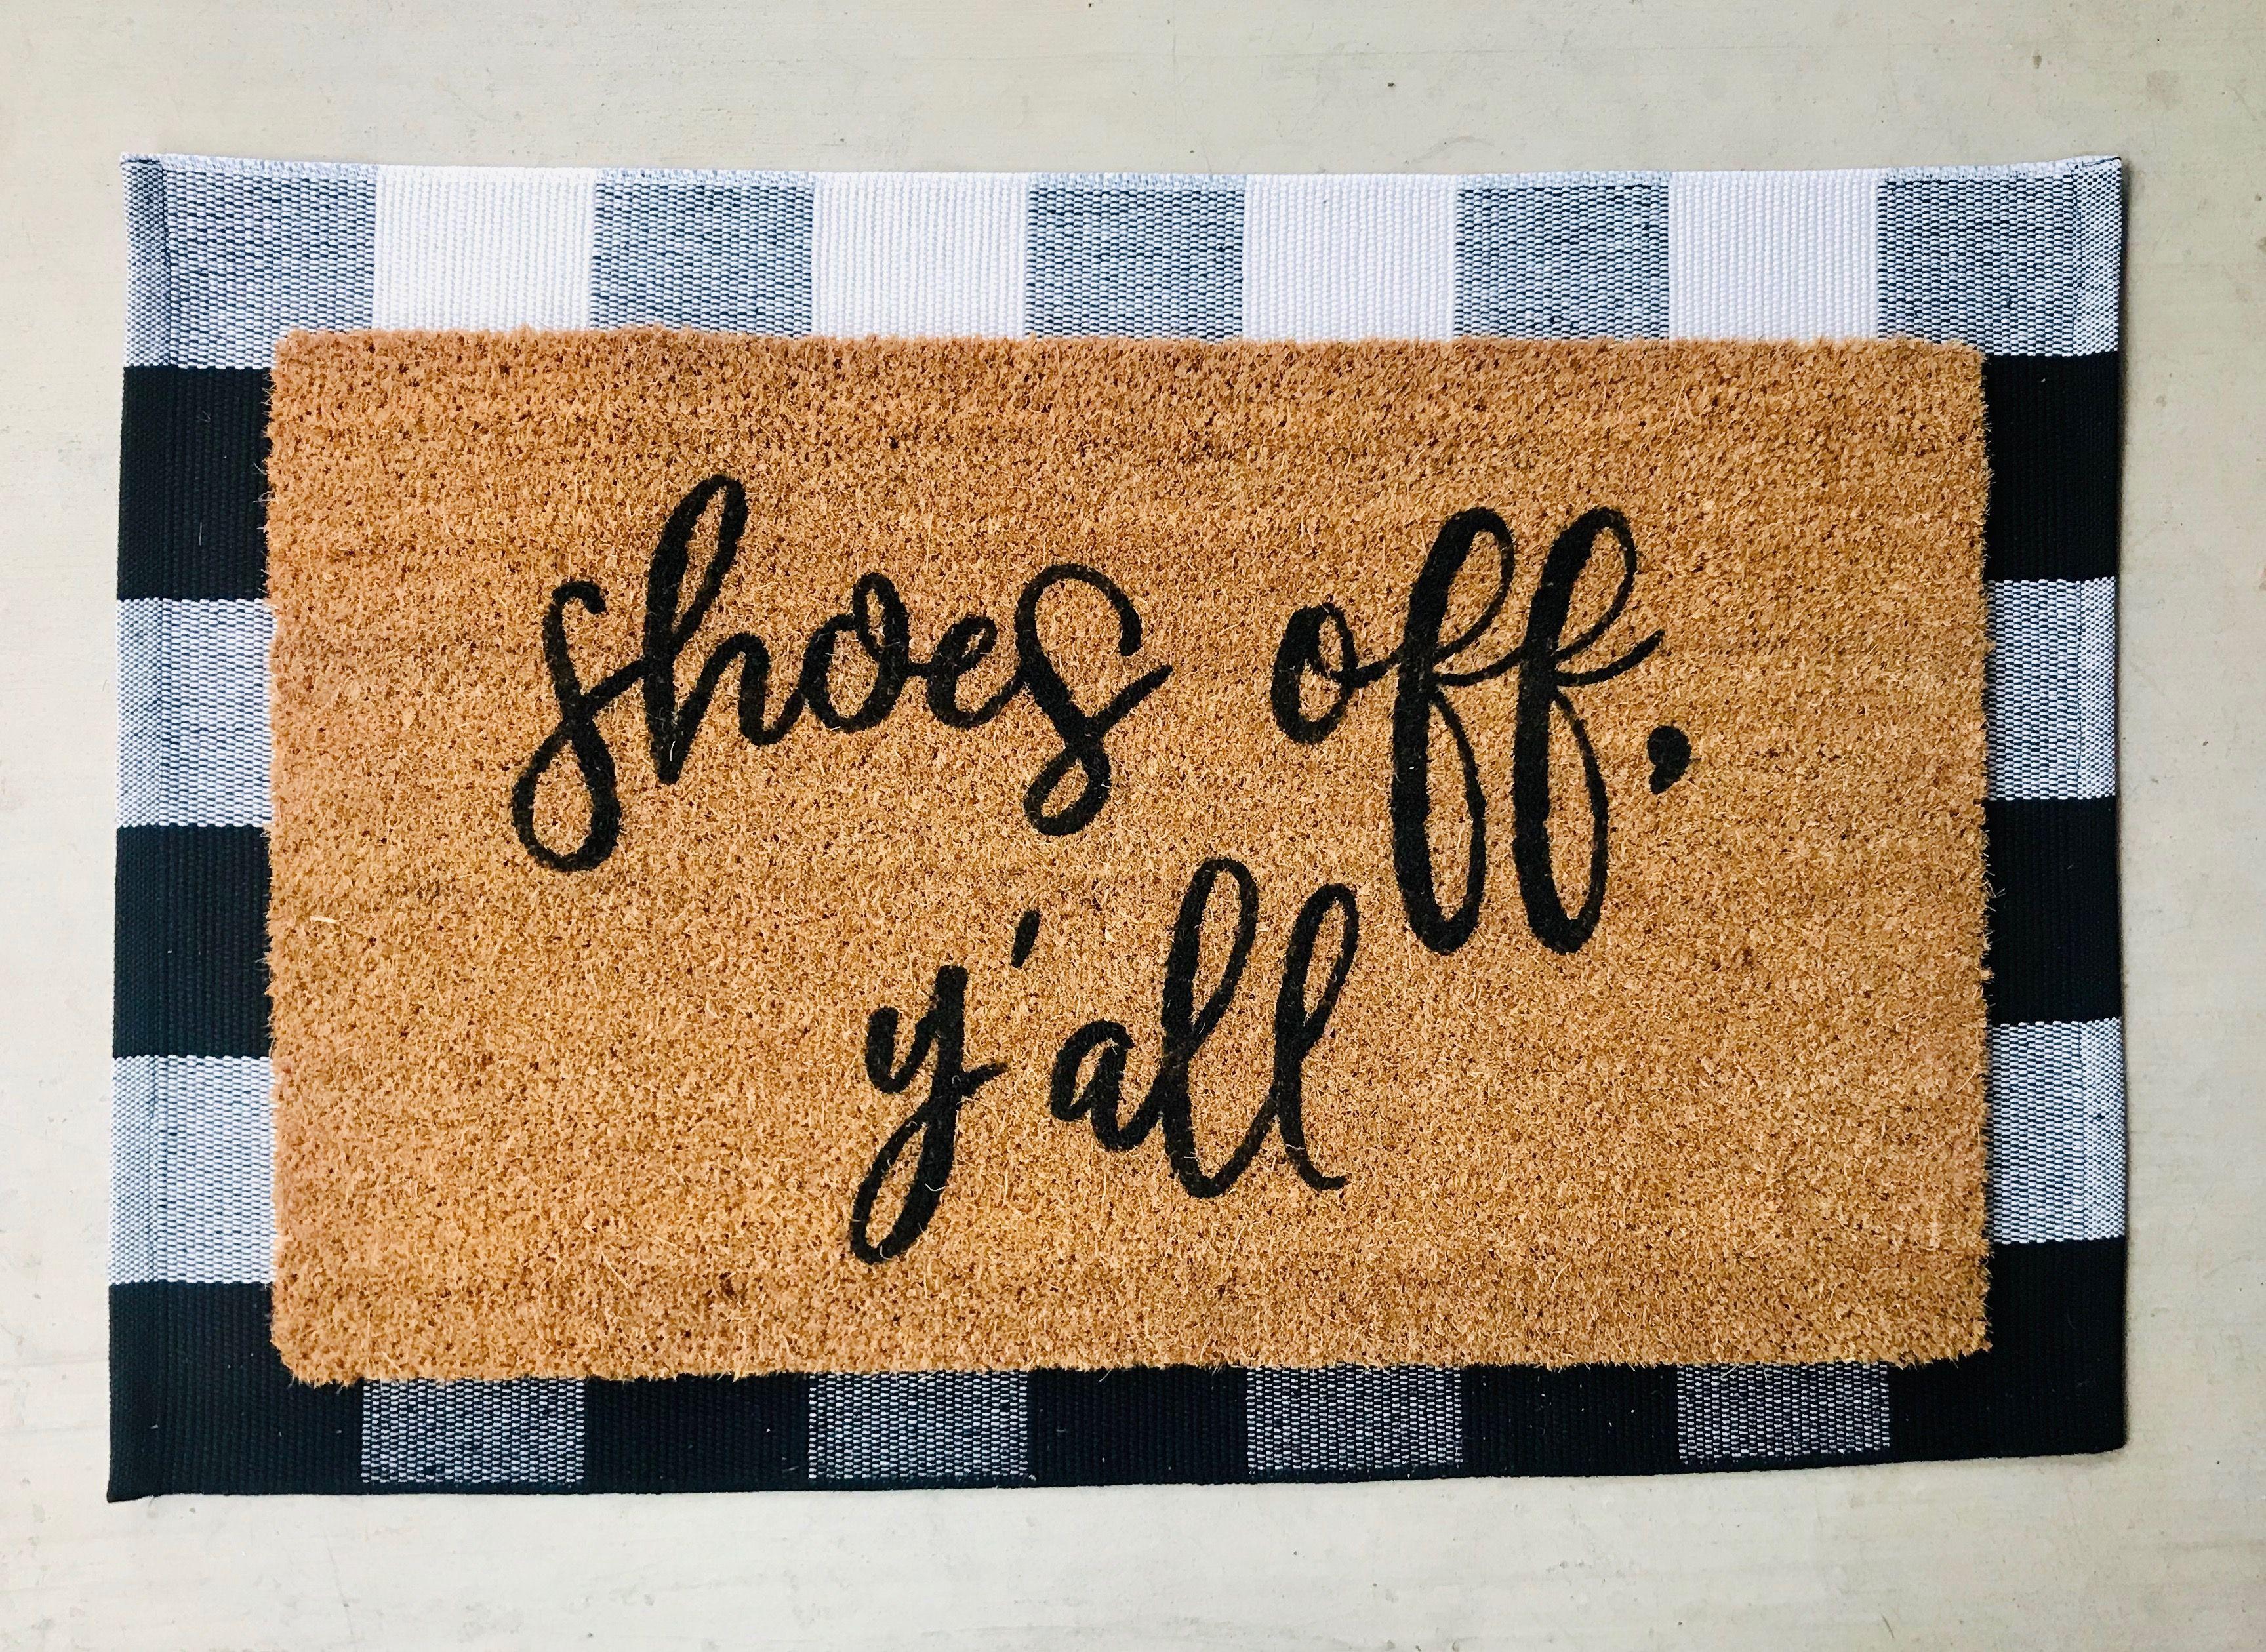 Shoes Off Y All Doormat Instructional Doormat No Shoes Shoe